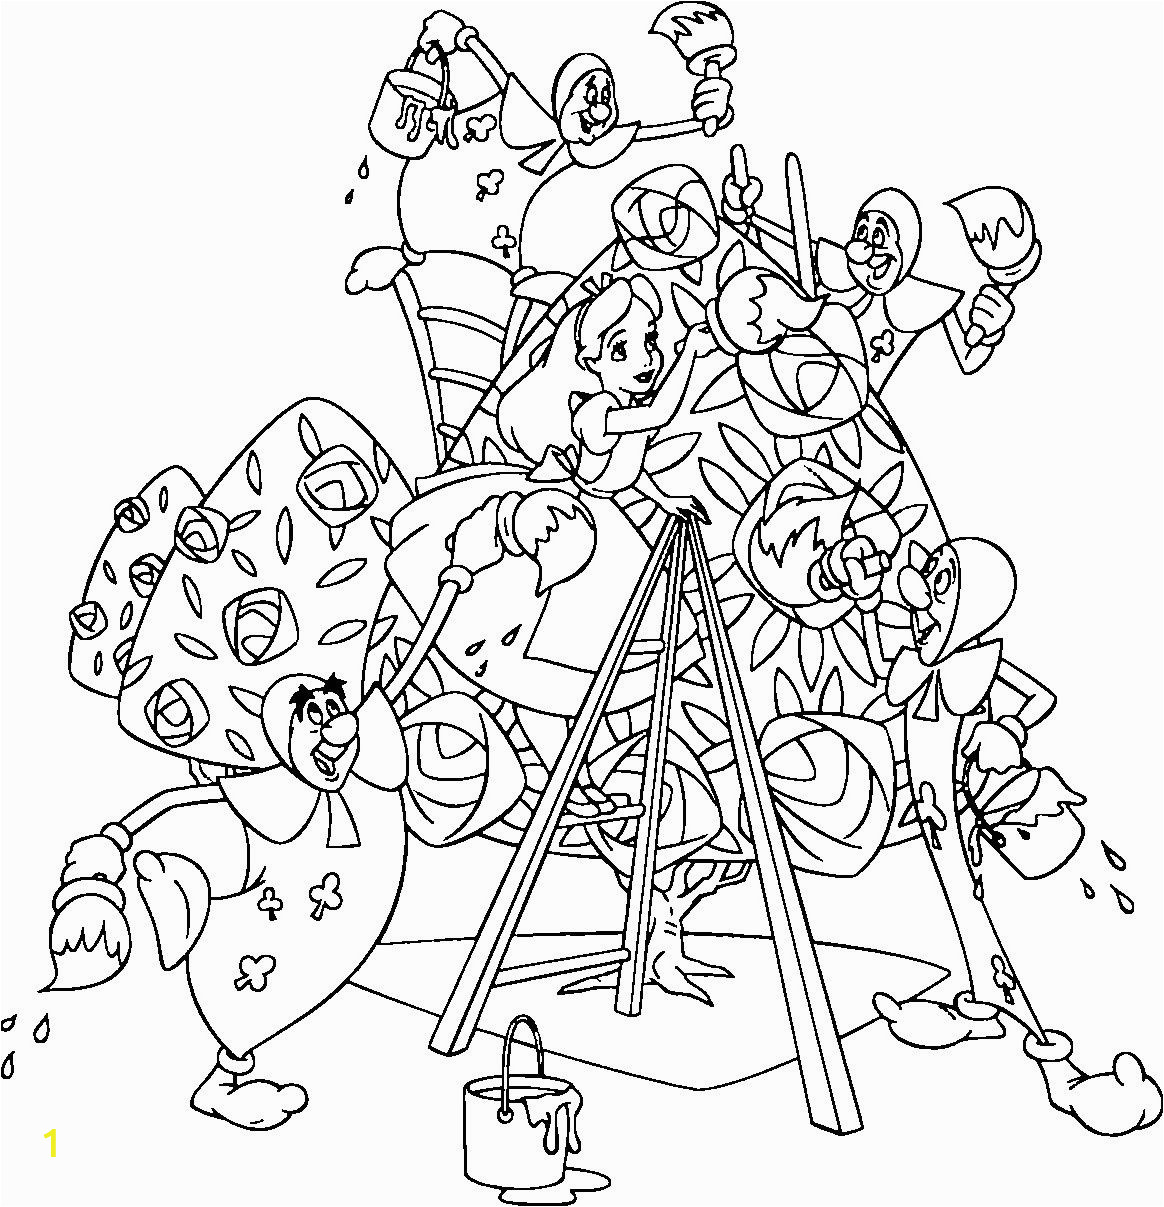 Coloring Pages Disney Alice In Wonderland Alice and Wonderland Club Cards Coloring Pages